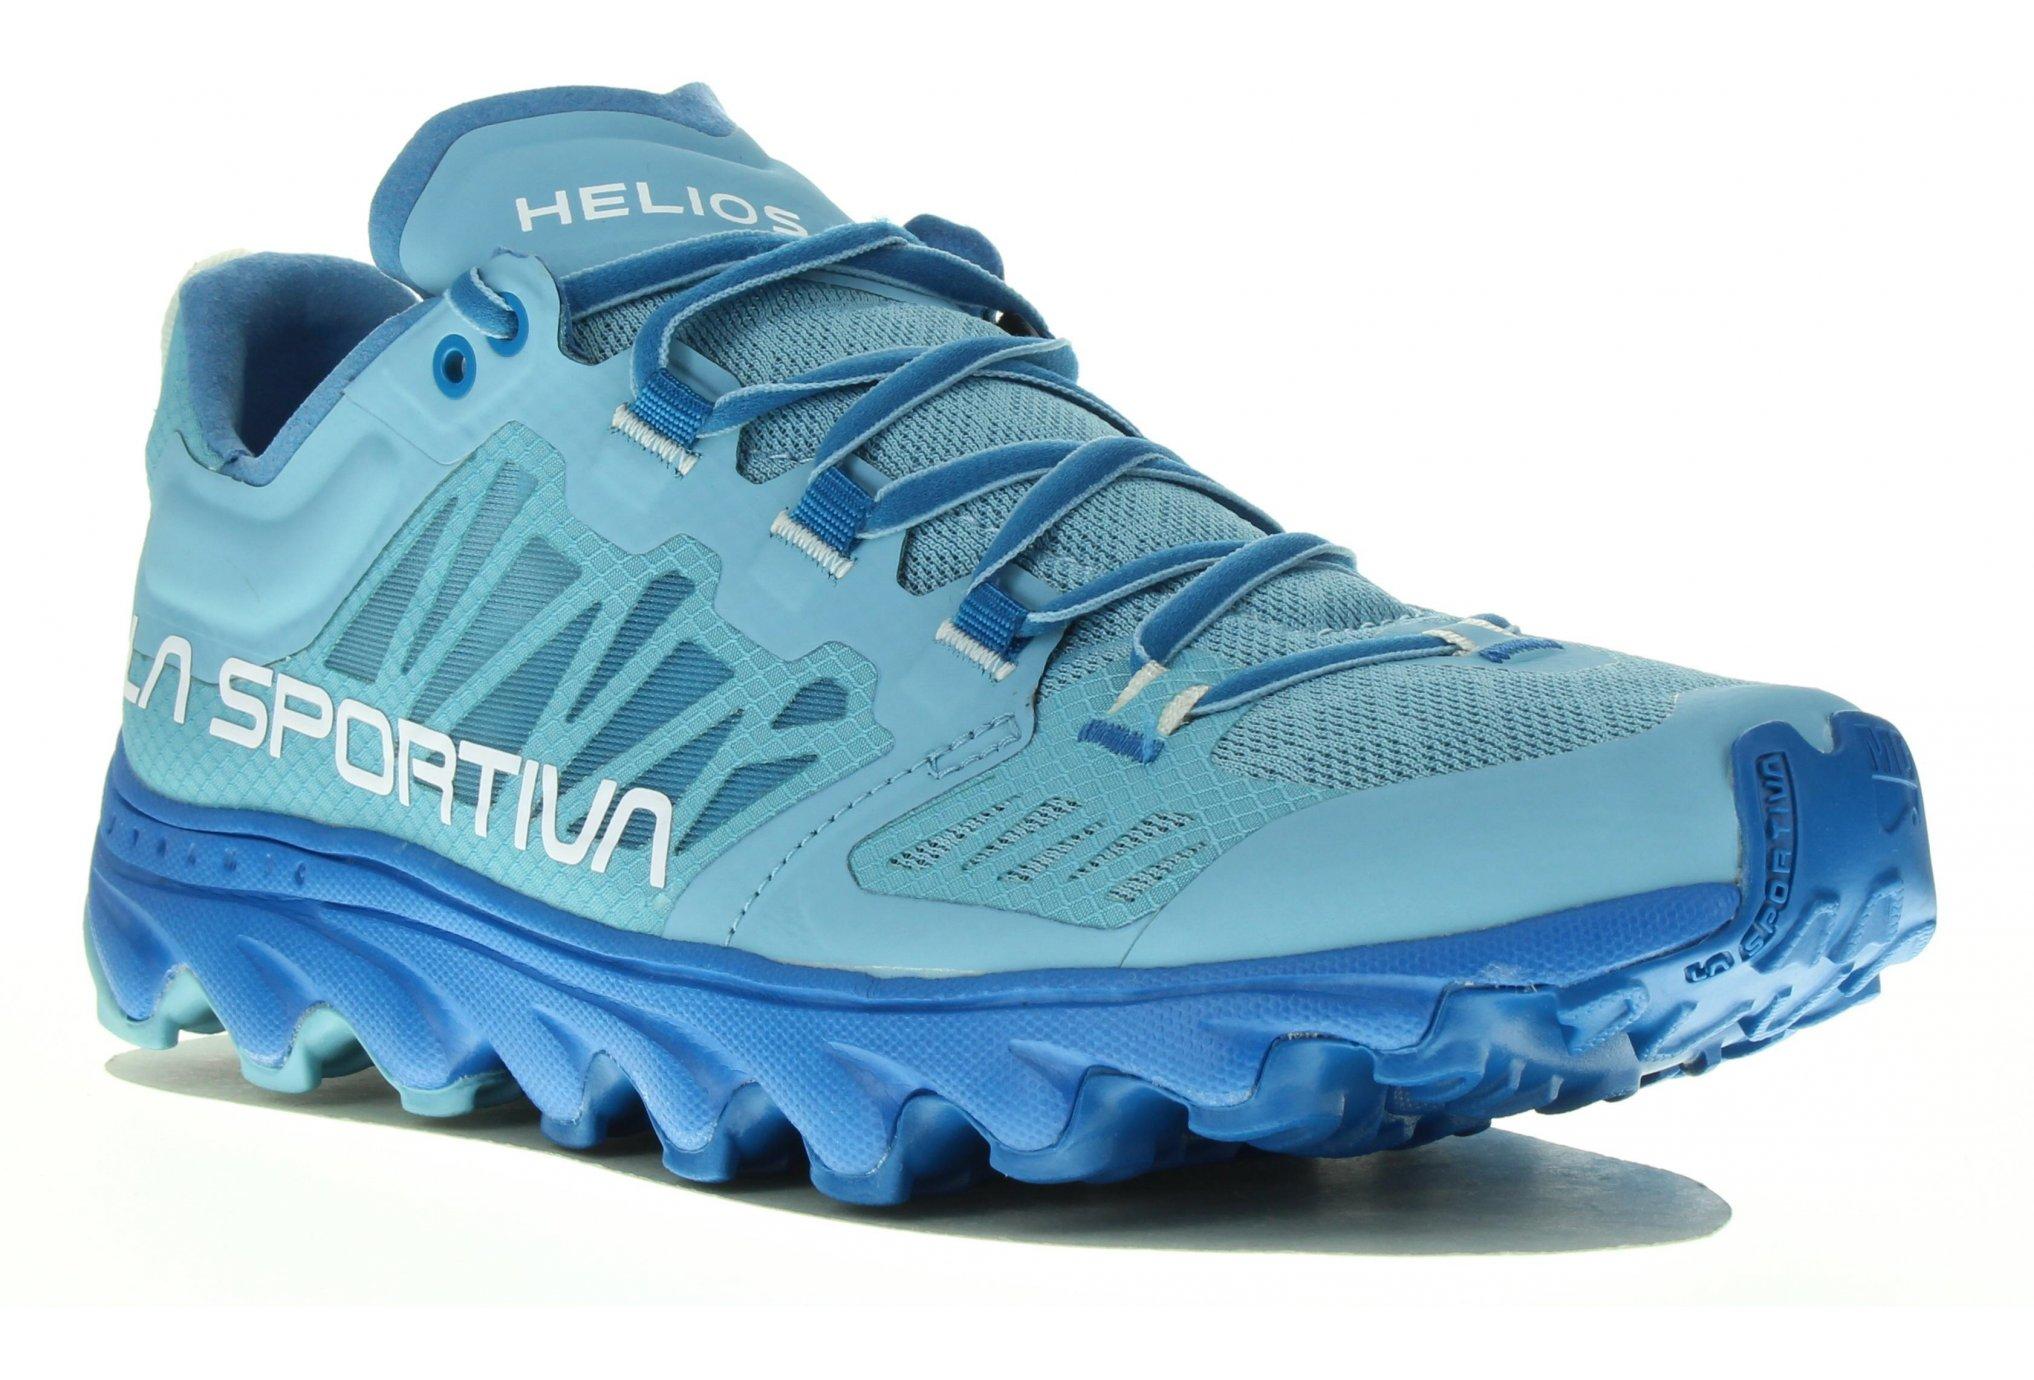 La Sportiva Helios III Chaussures running femme